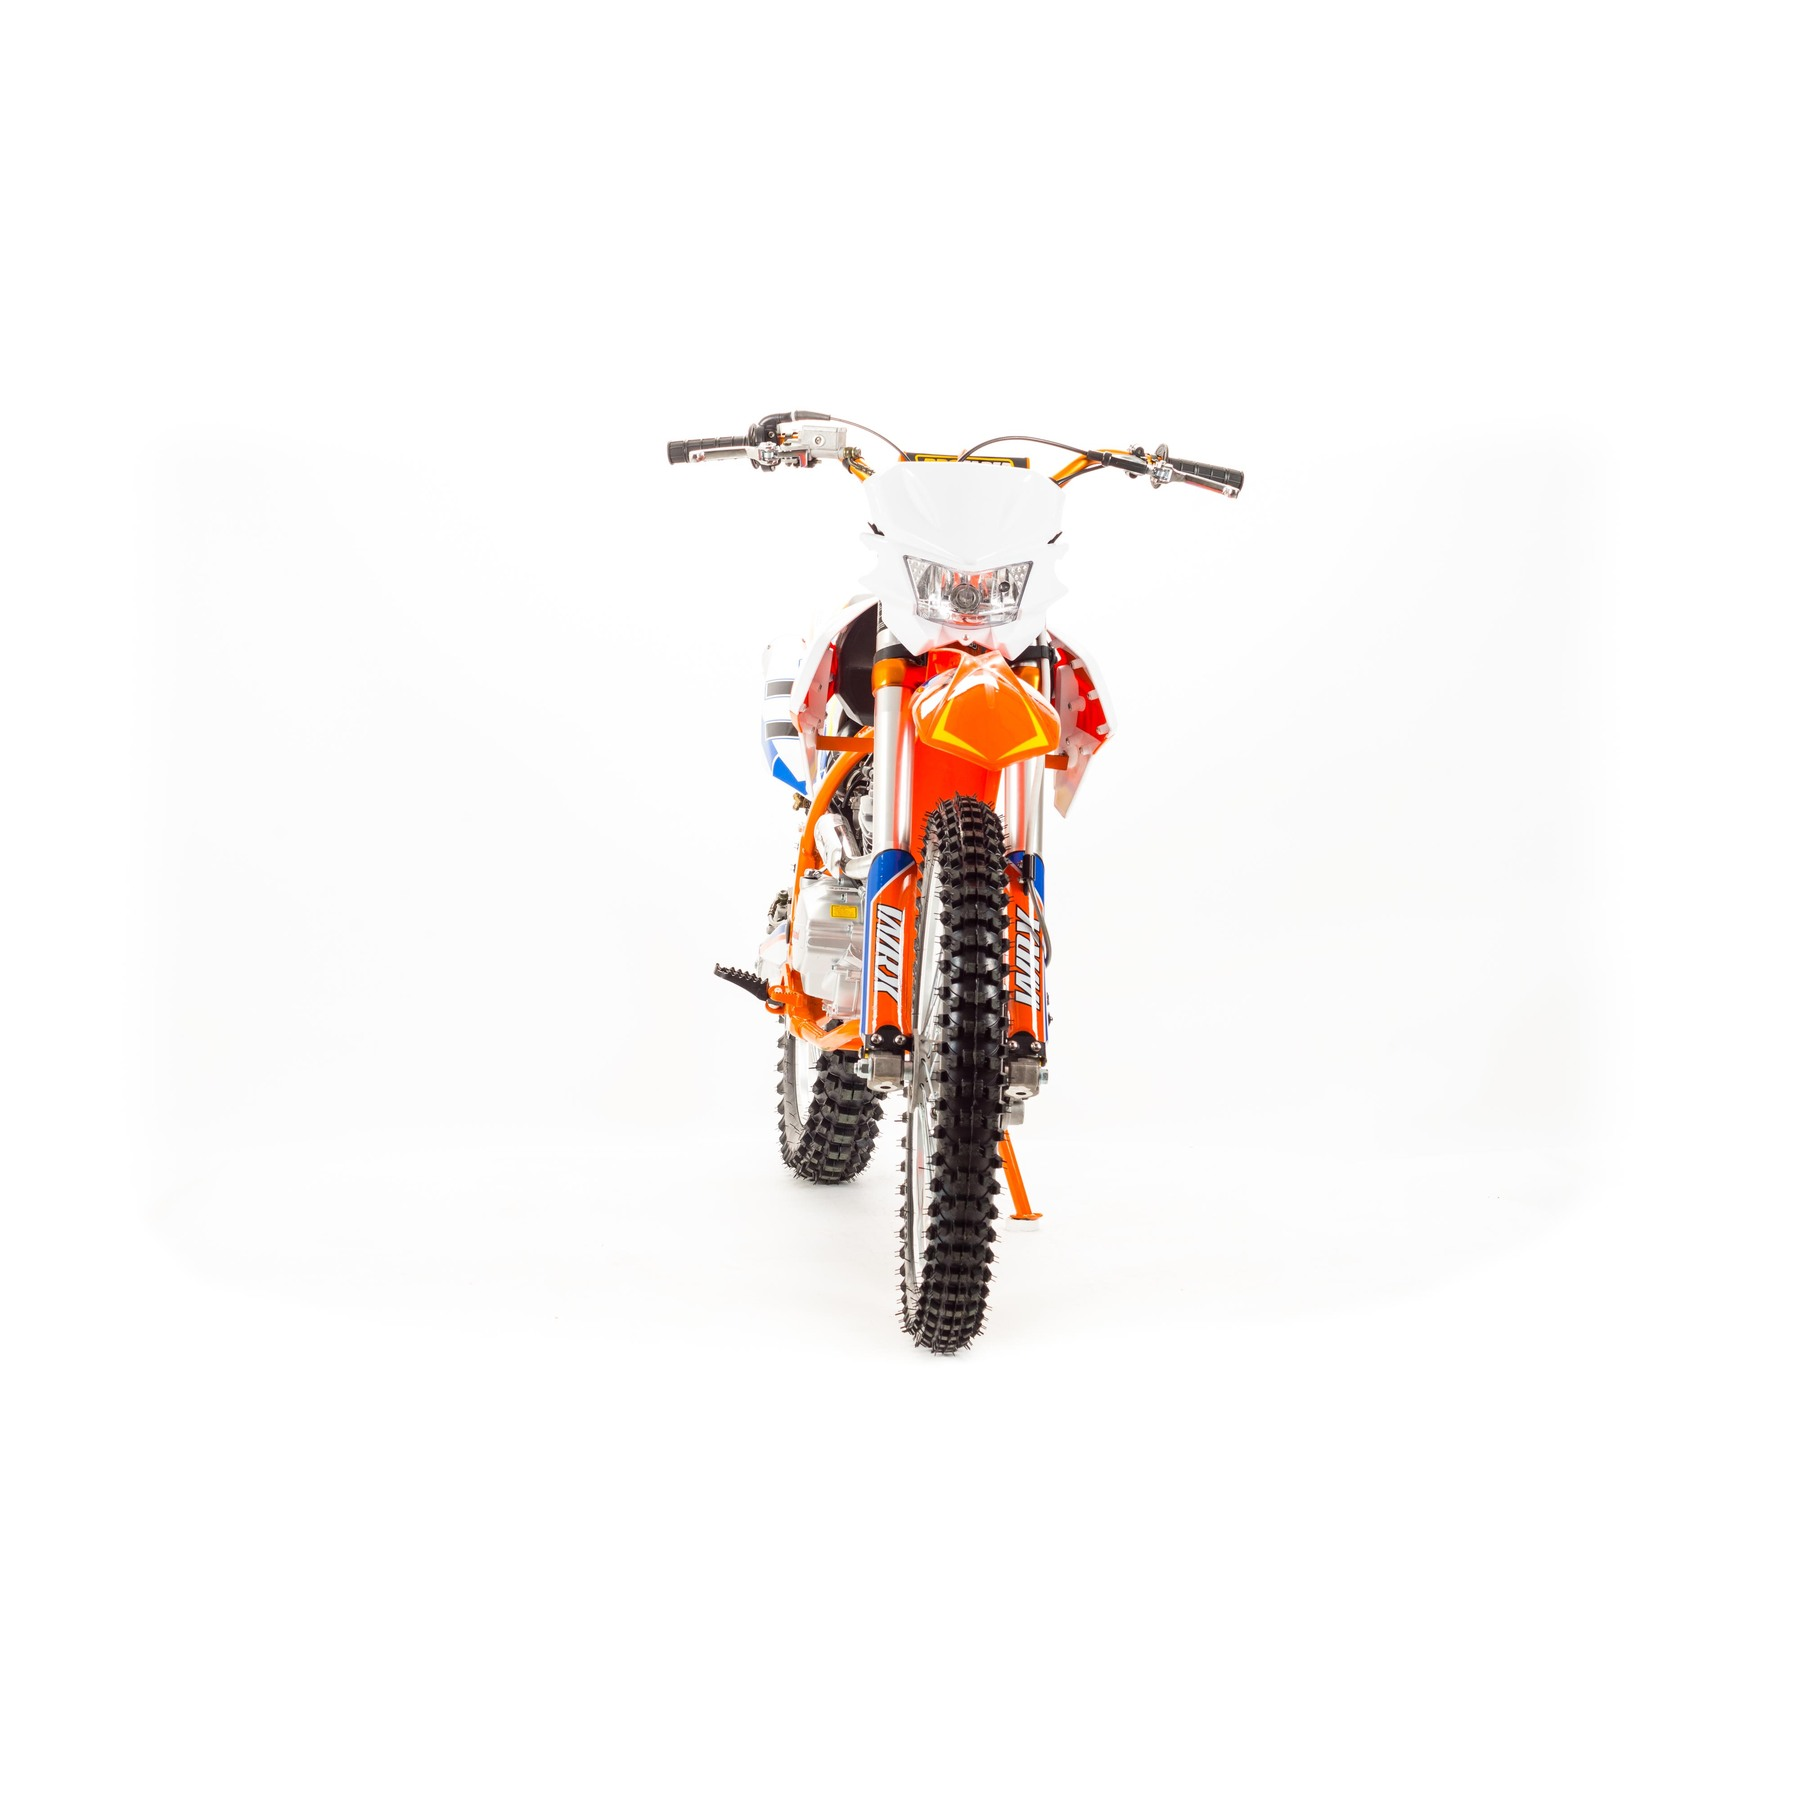 Мотоцикл Motoland WRX 250 KT